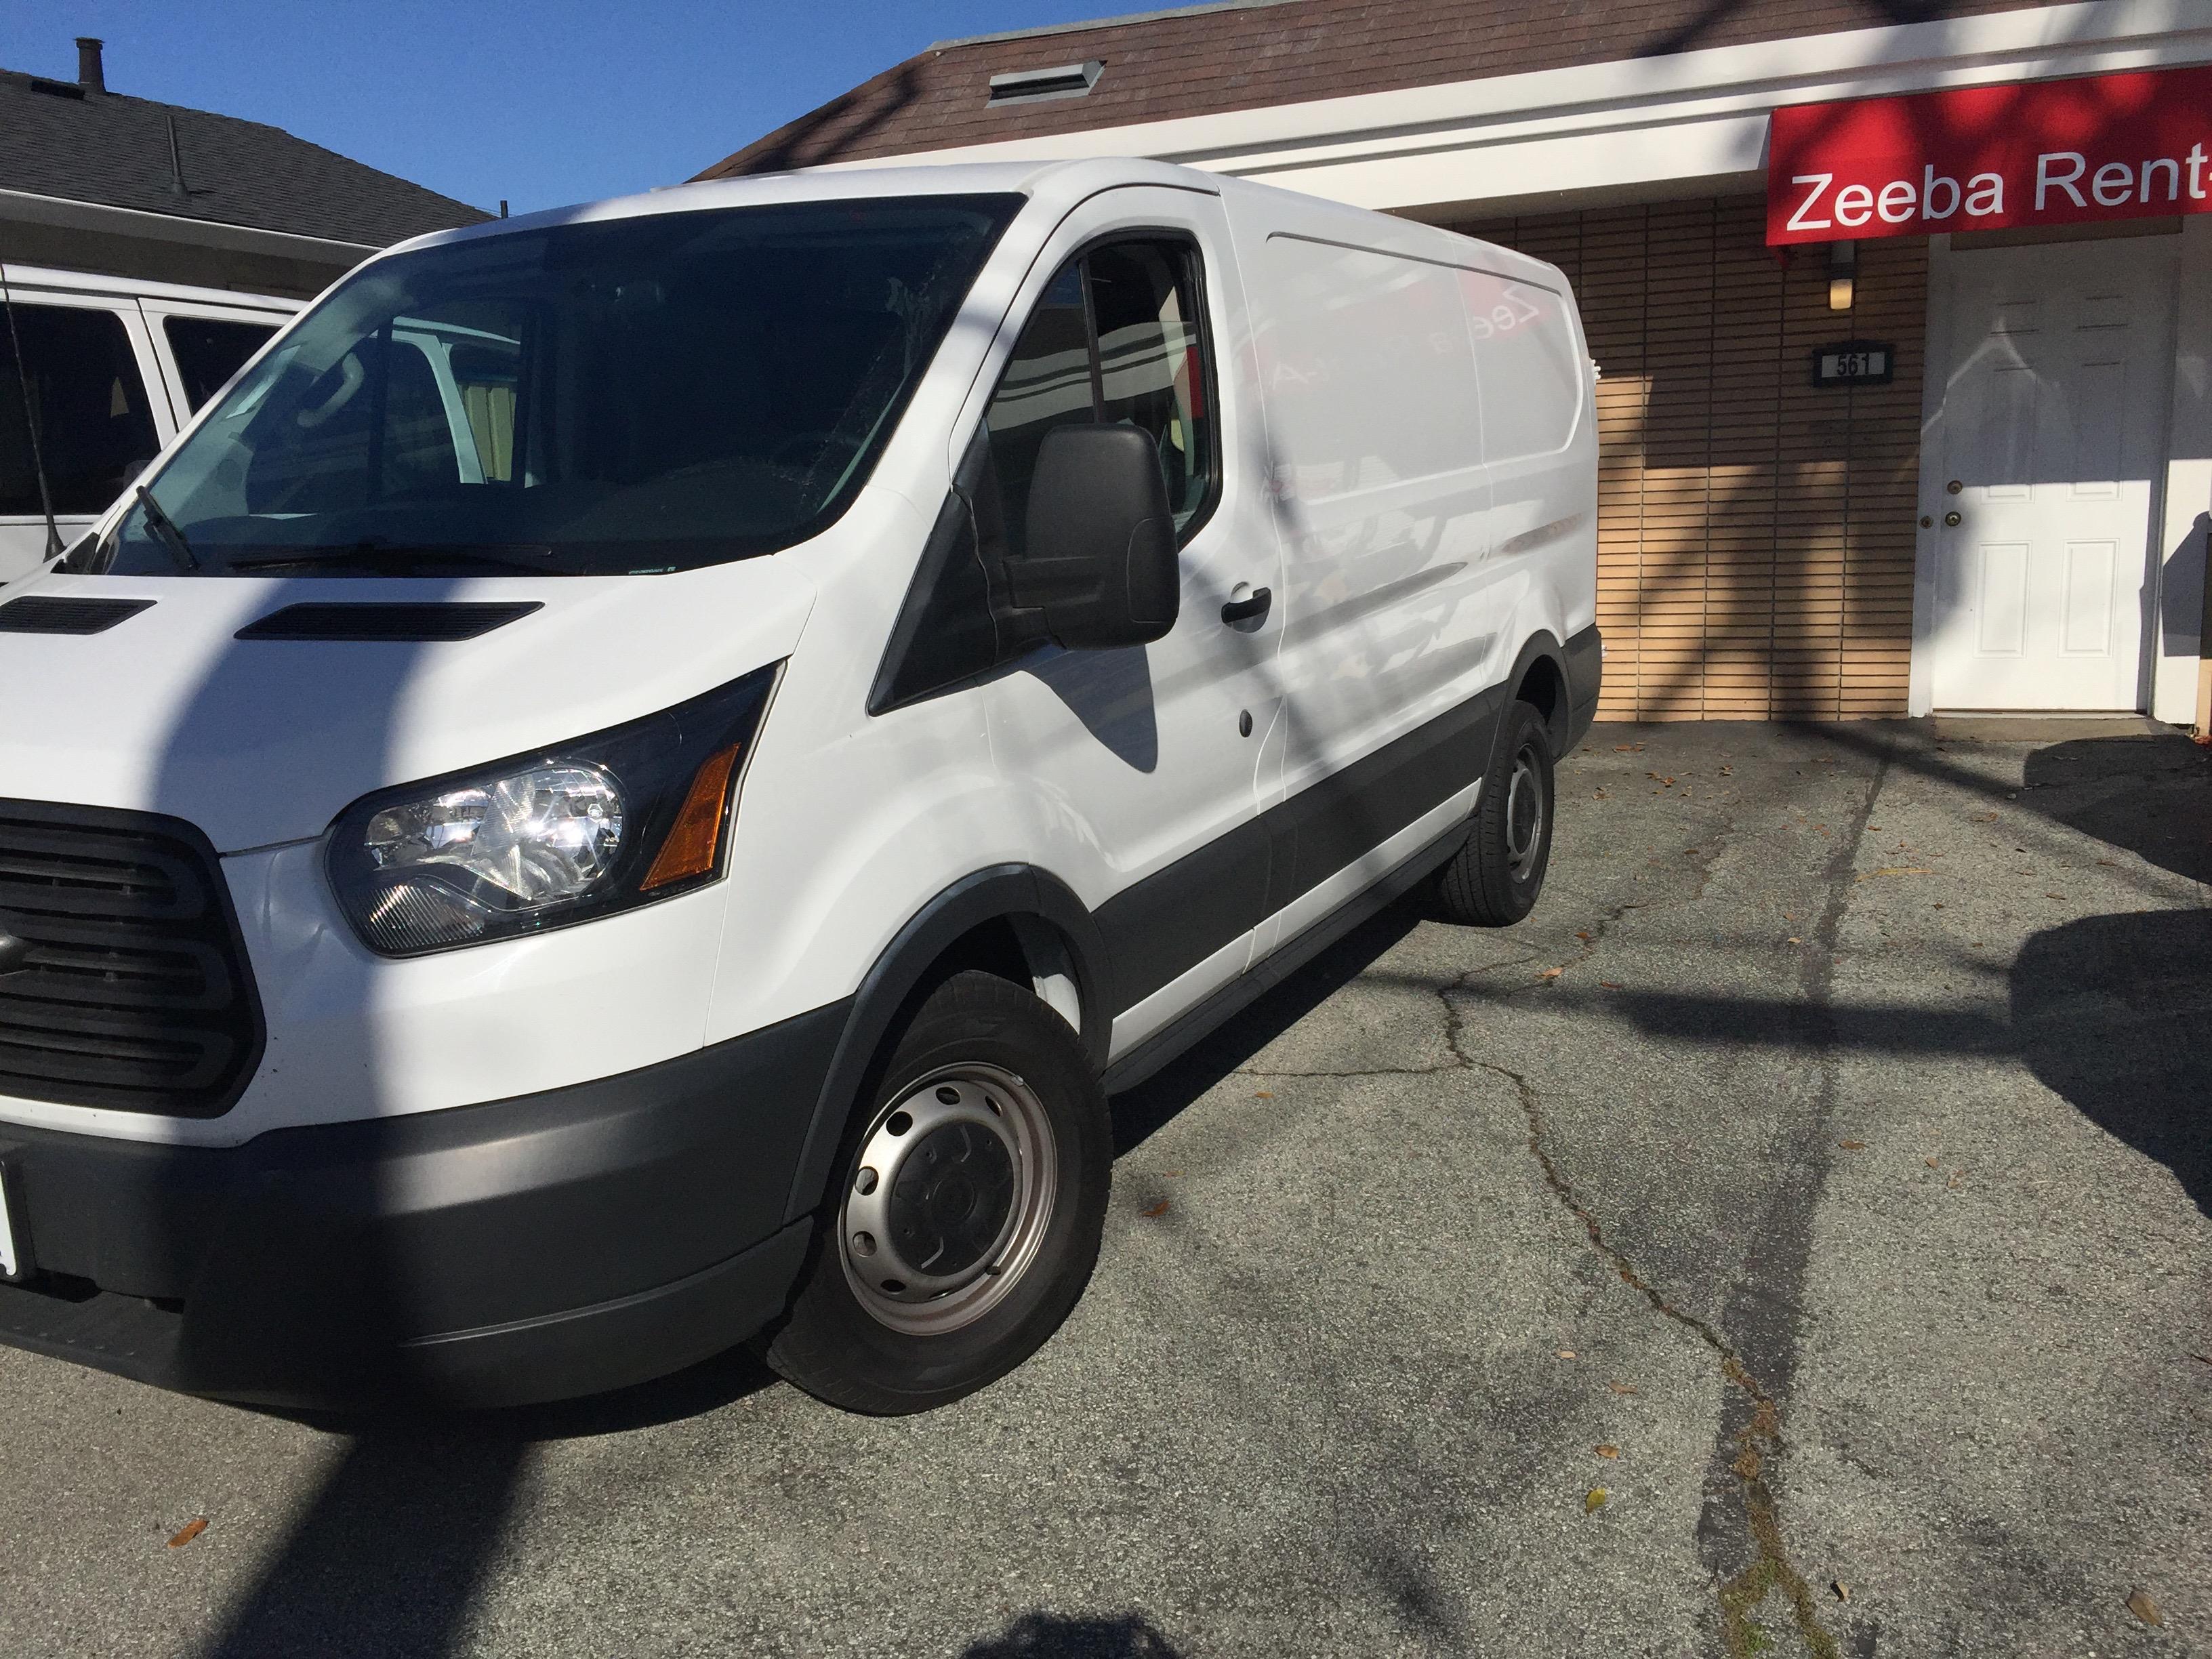 Zeeba Rent A Van 561 W Hedding St San Jose Ca 95110 Yp Com